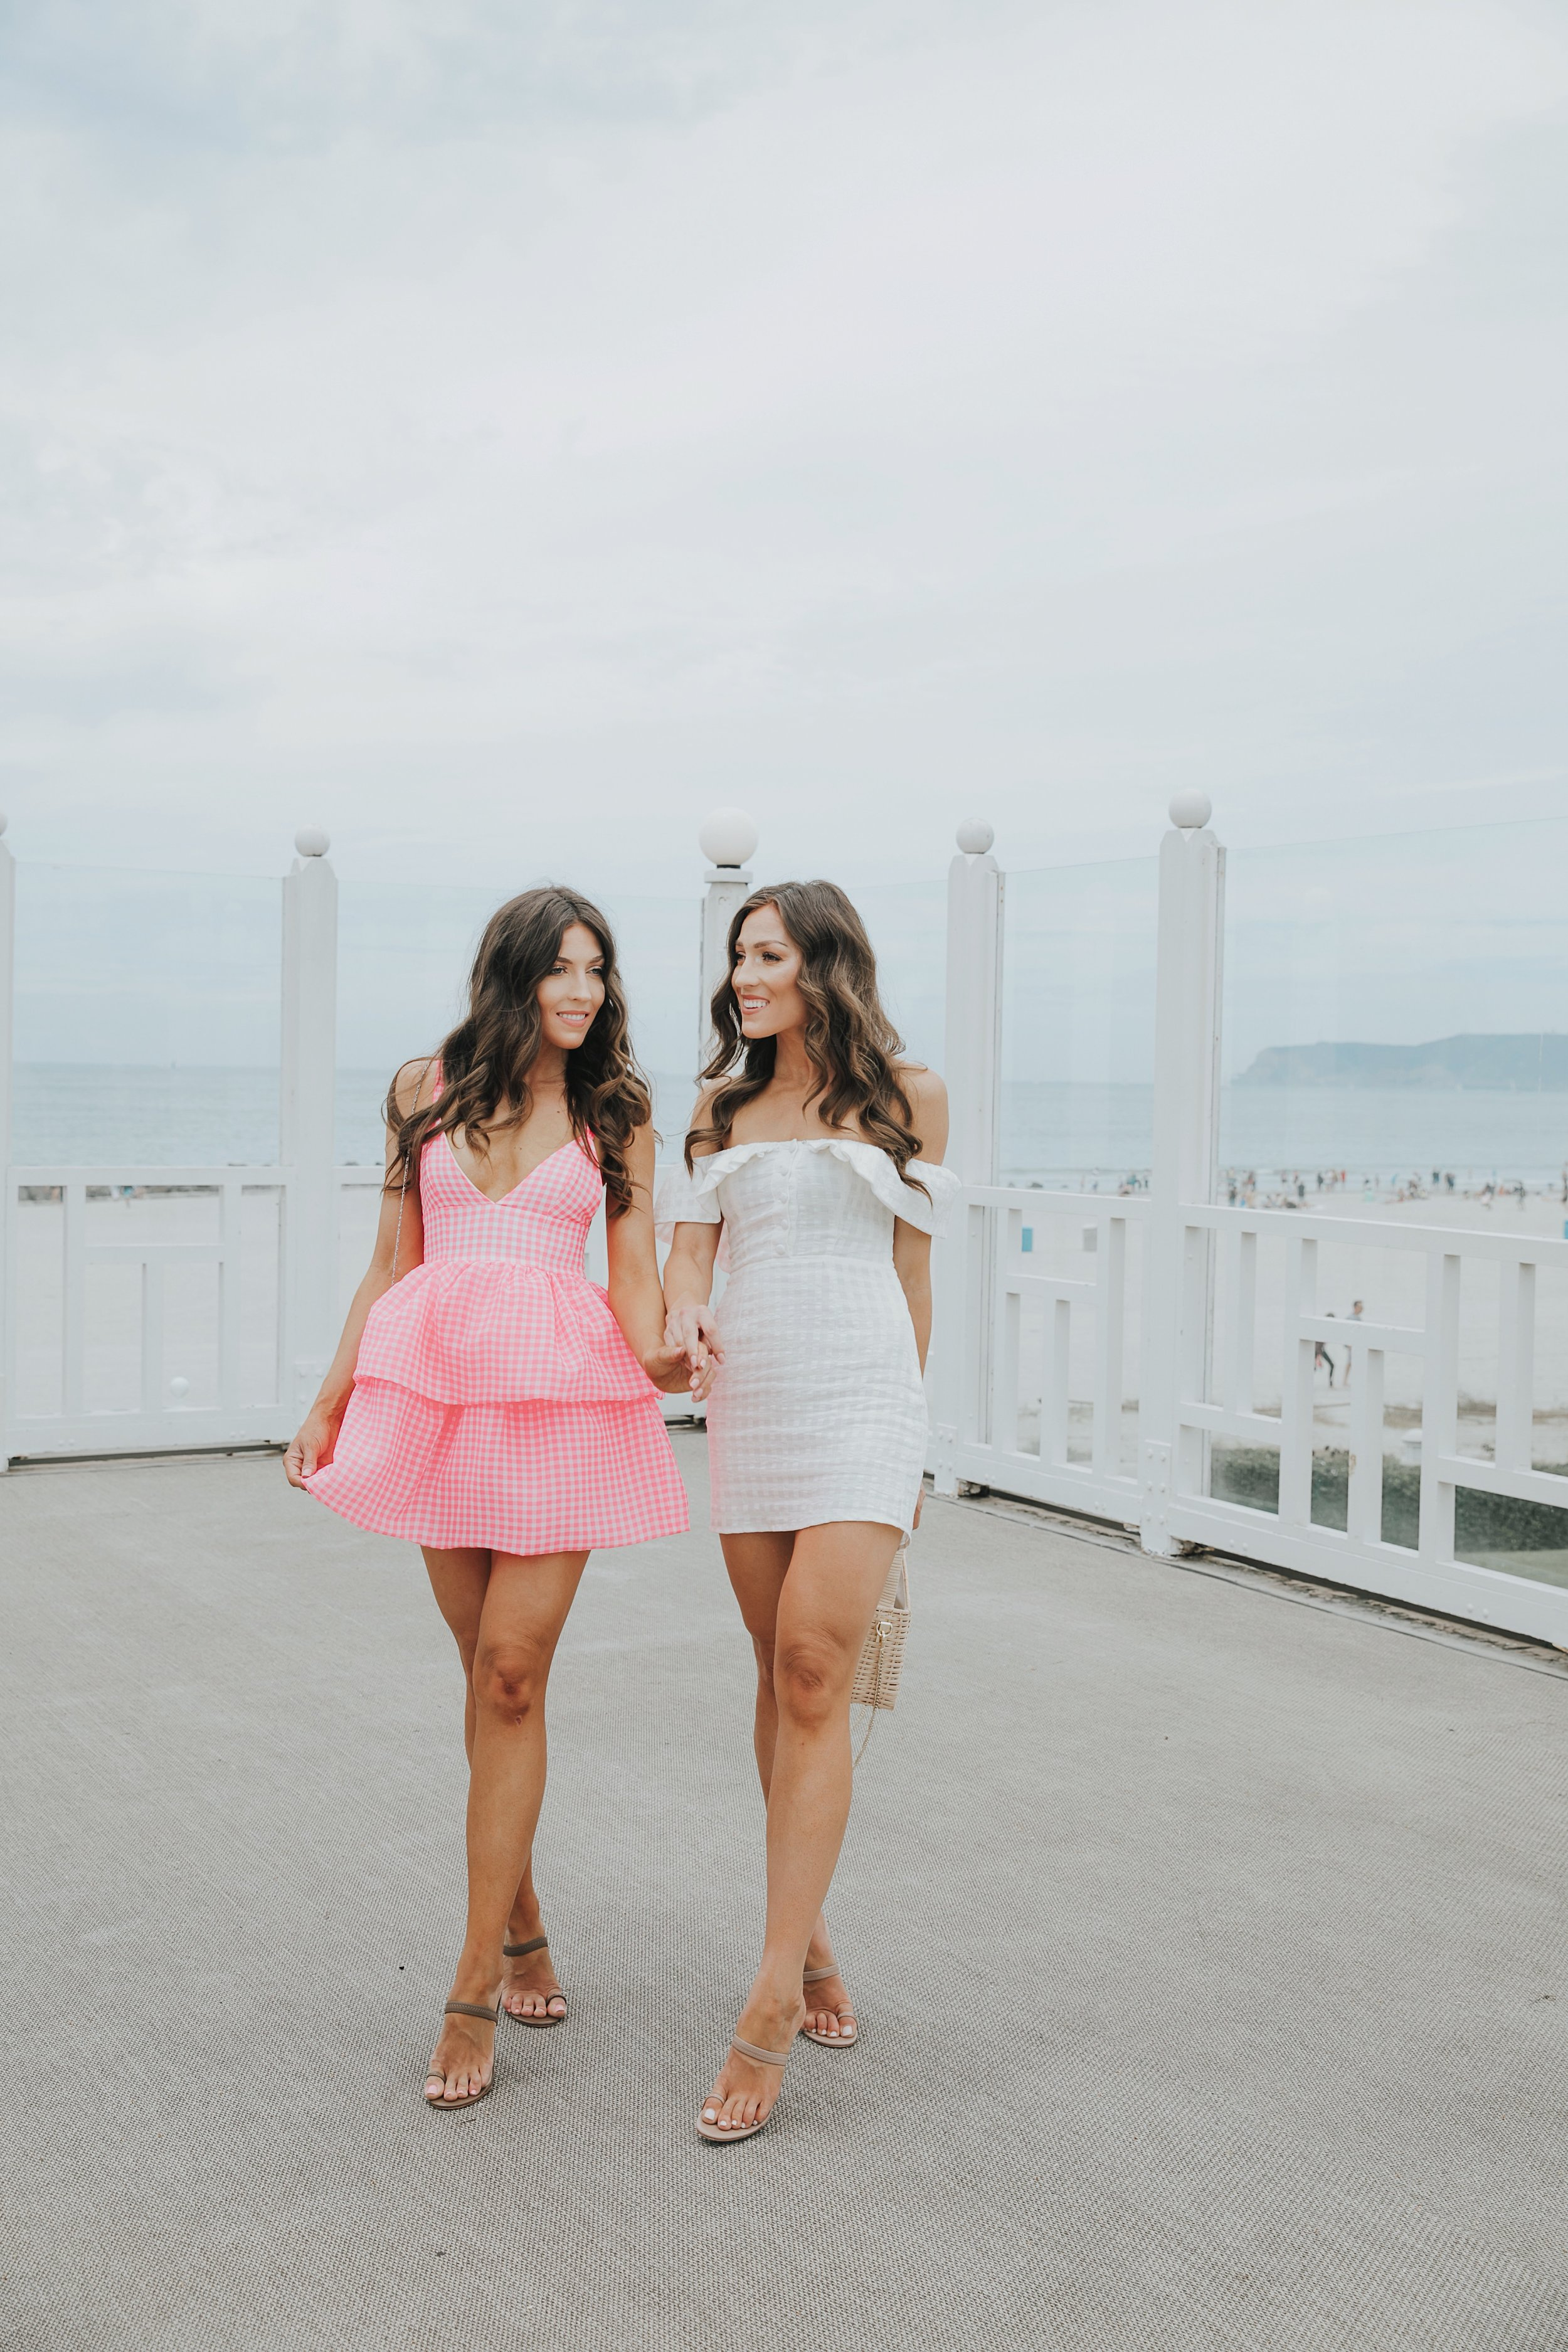 Revolve Gingham Summer Dresses at The Del Coronado 4.JPG